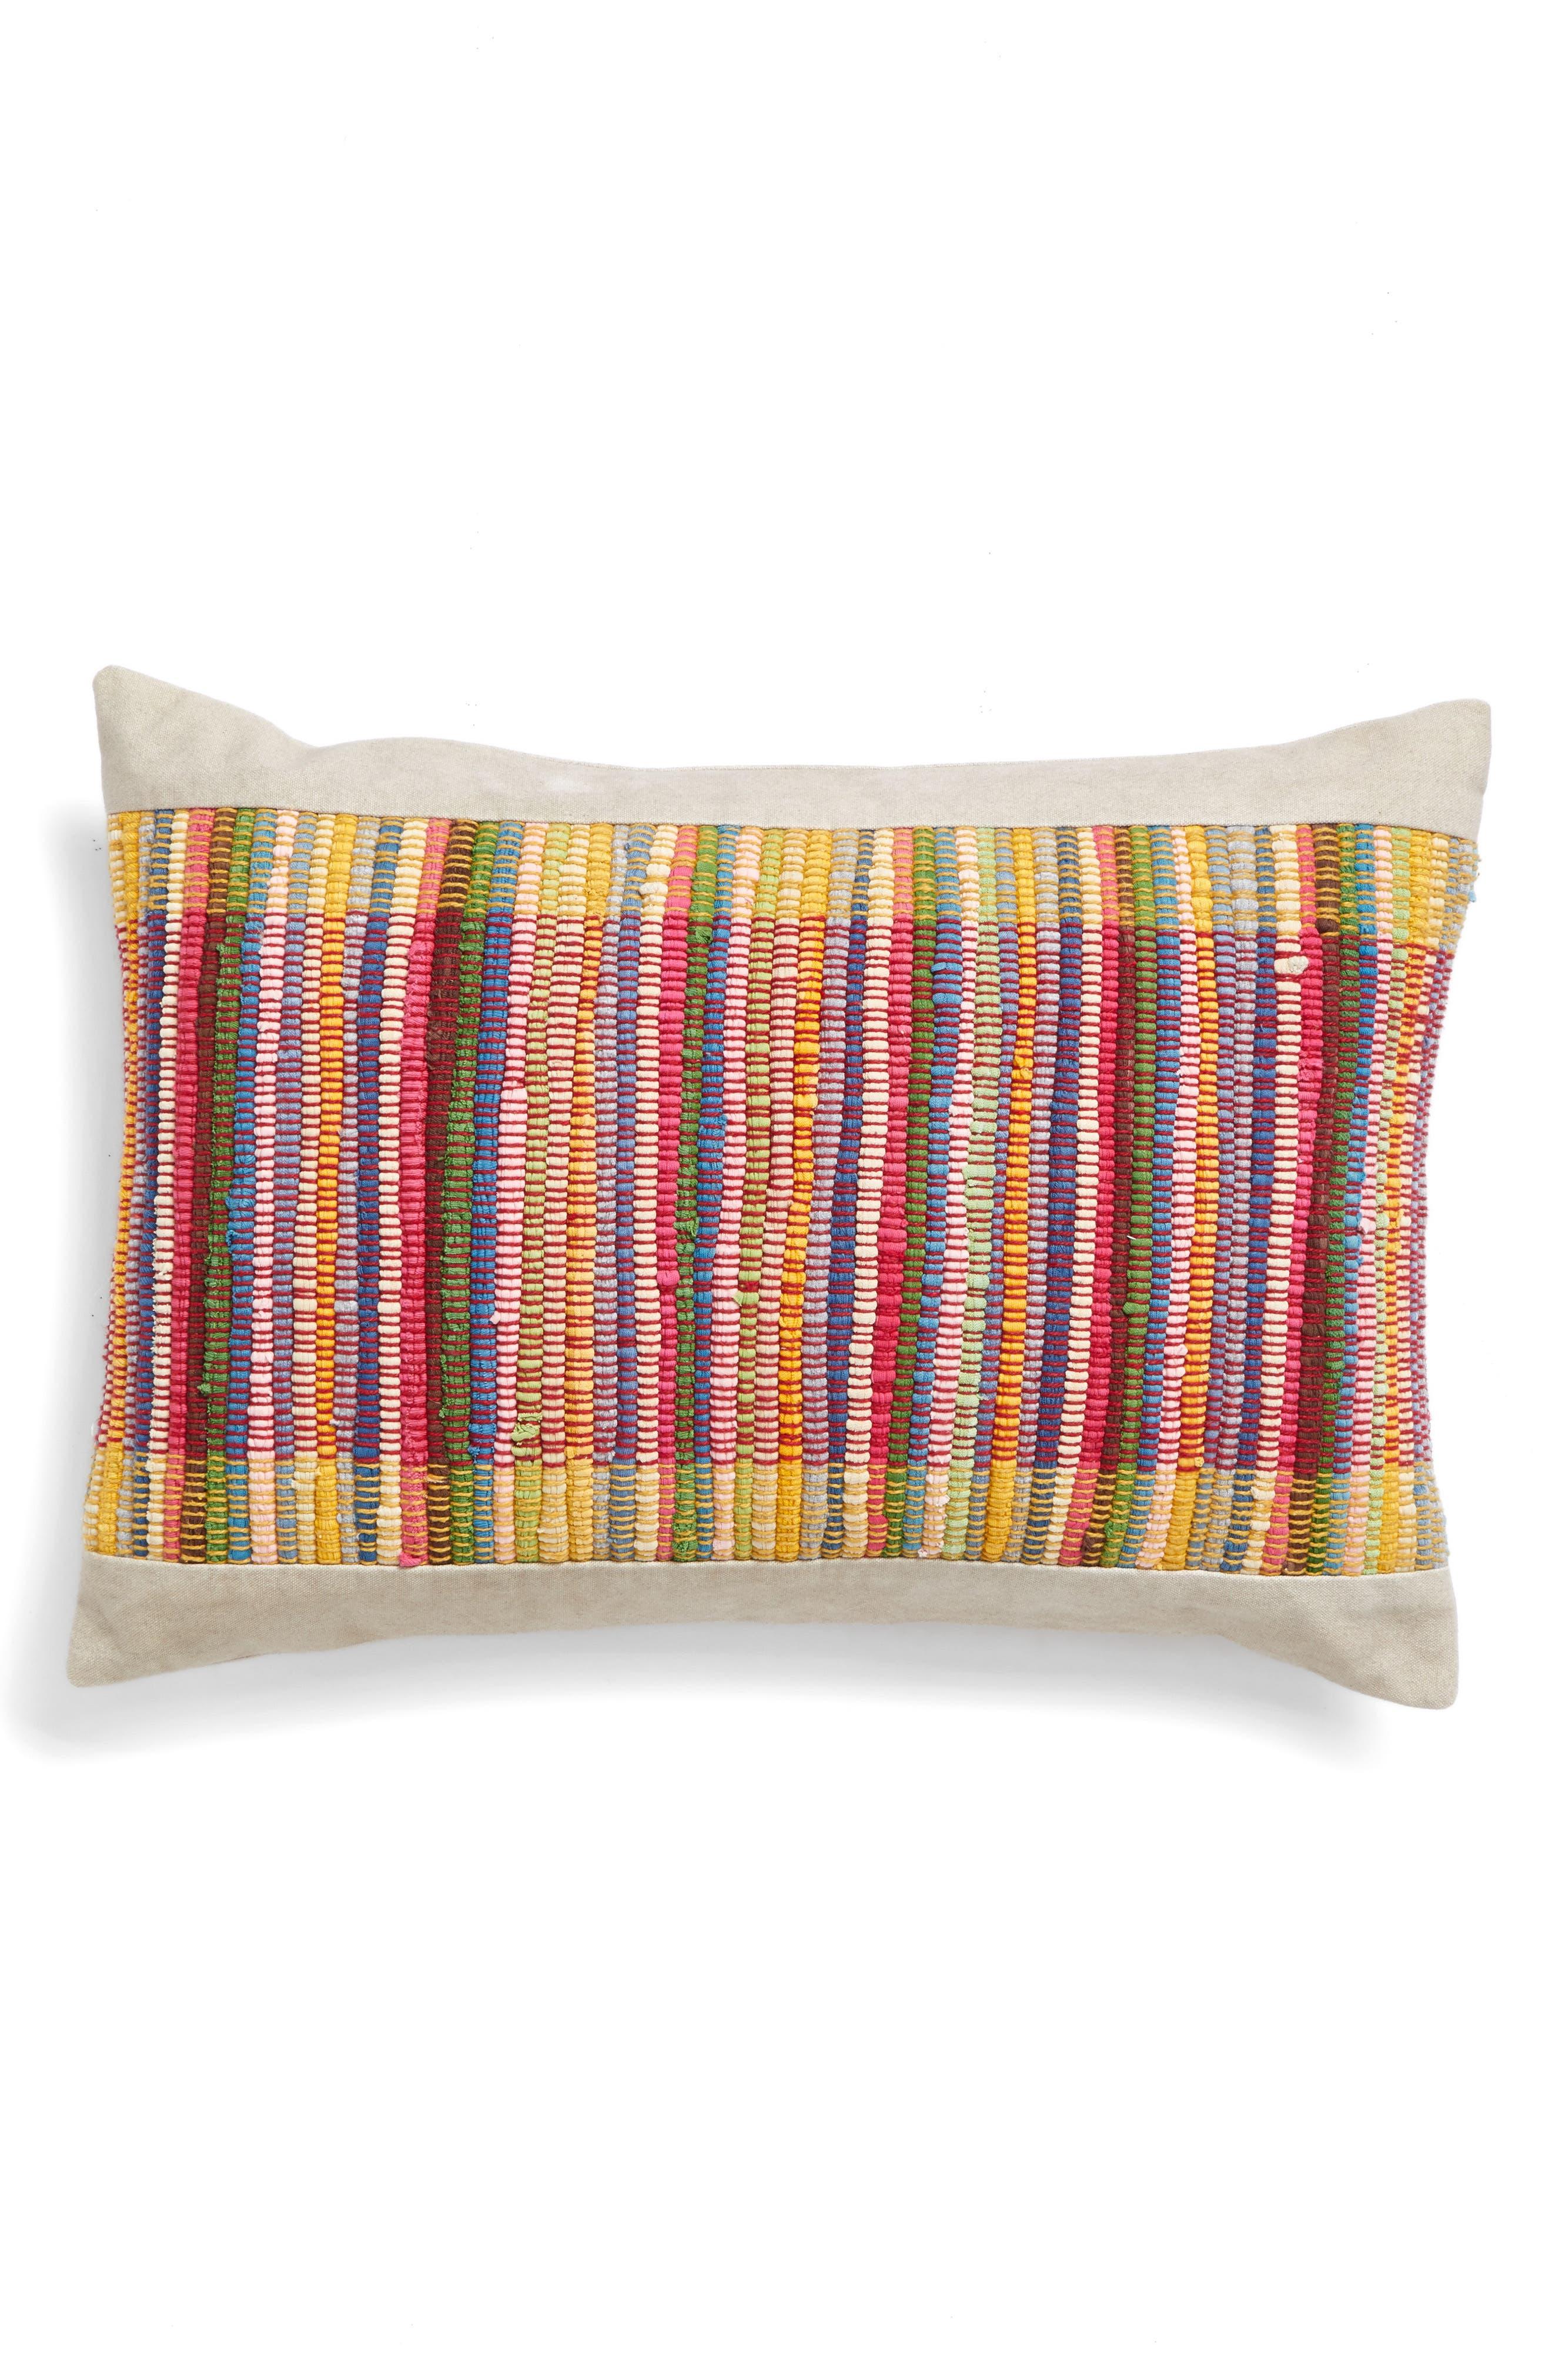 Woven Accent Pillow,                             Main thumbnail 1, color,                             250